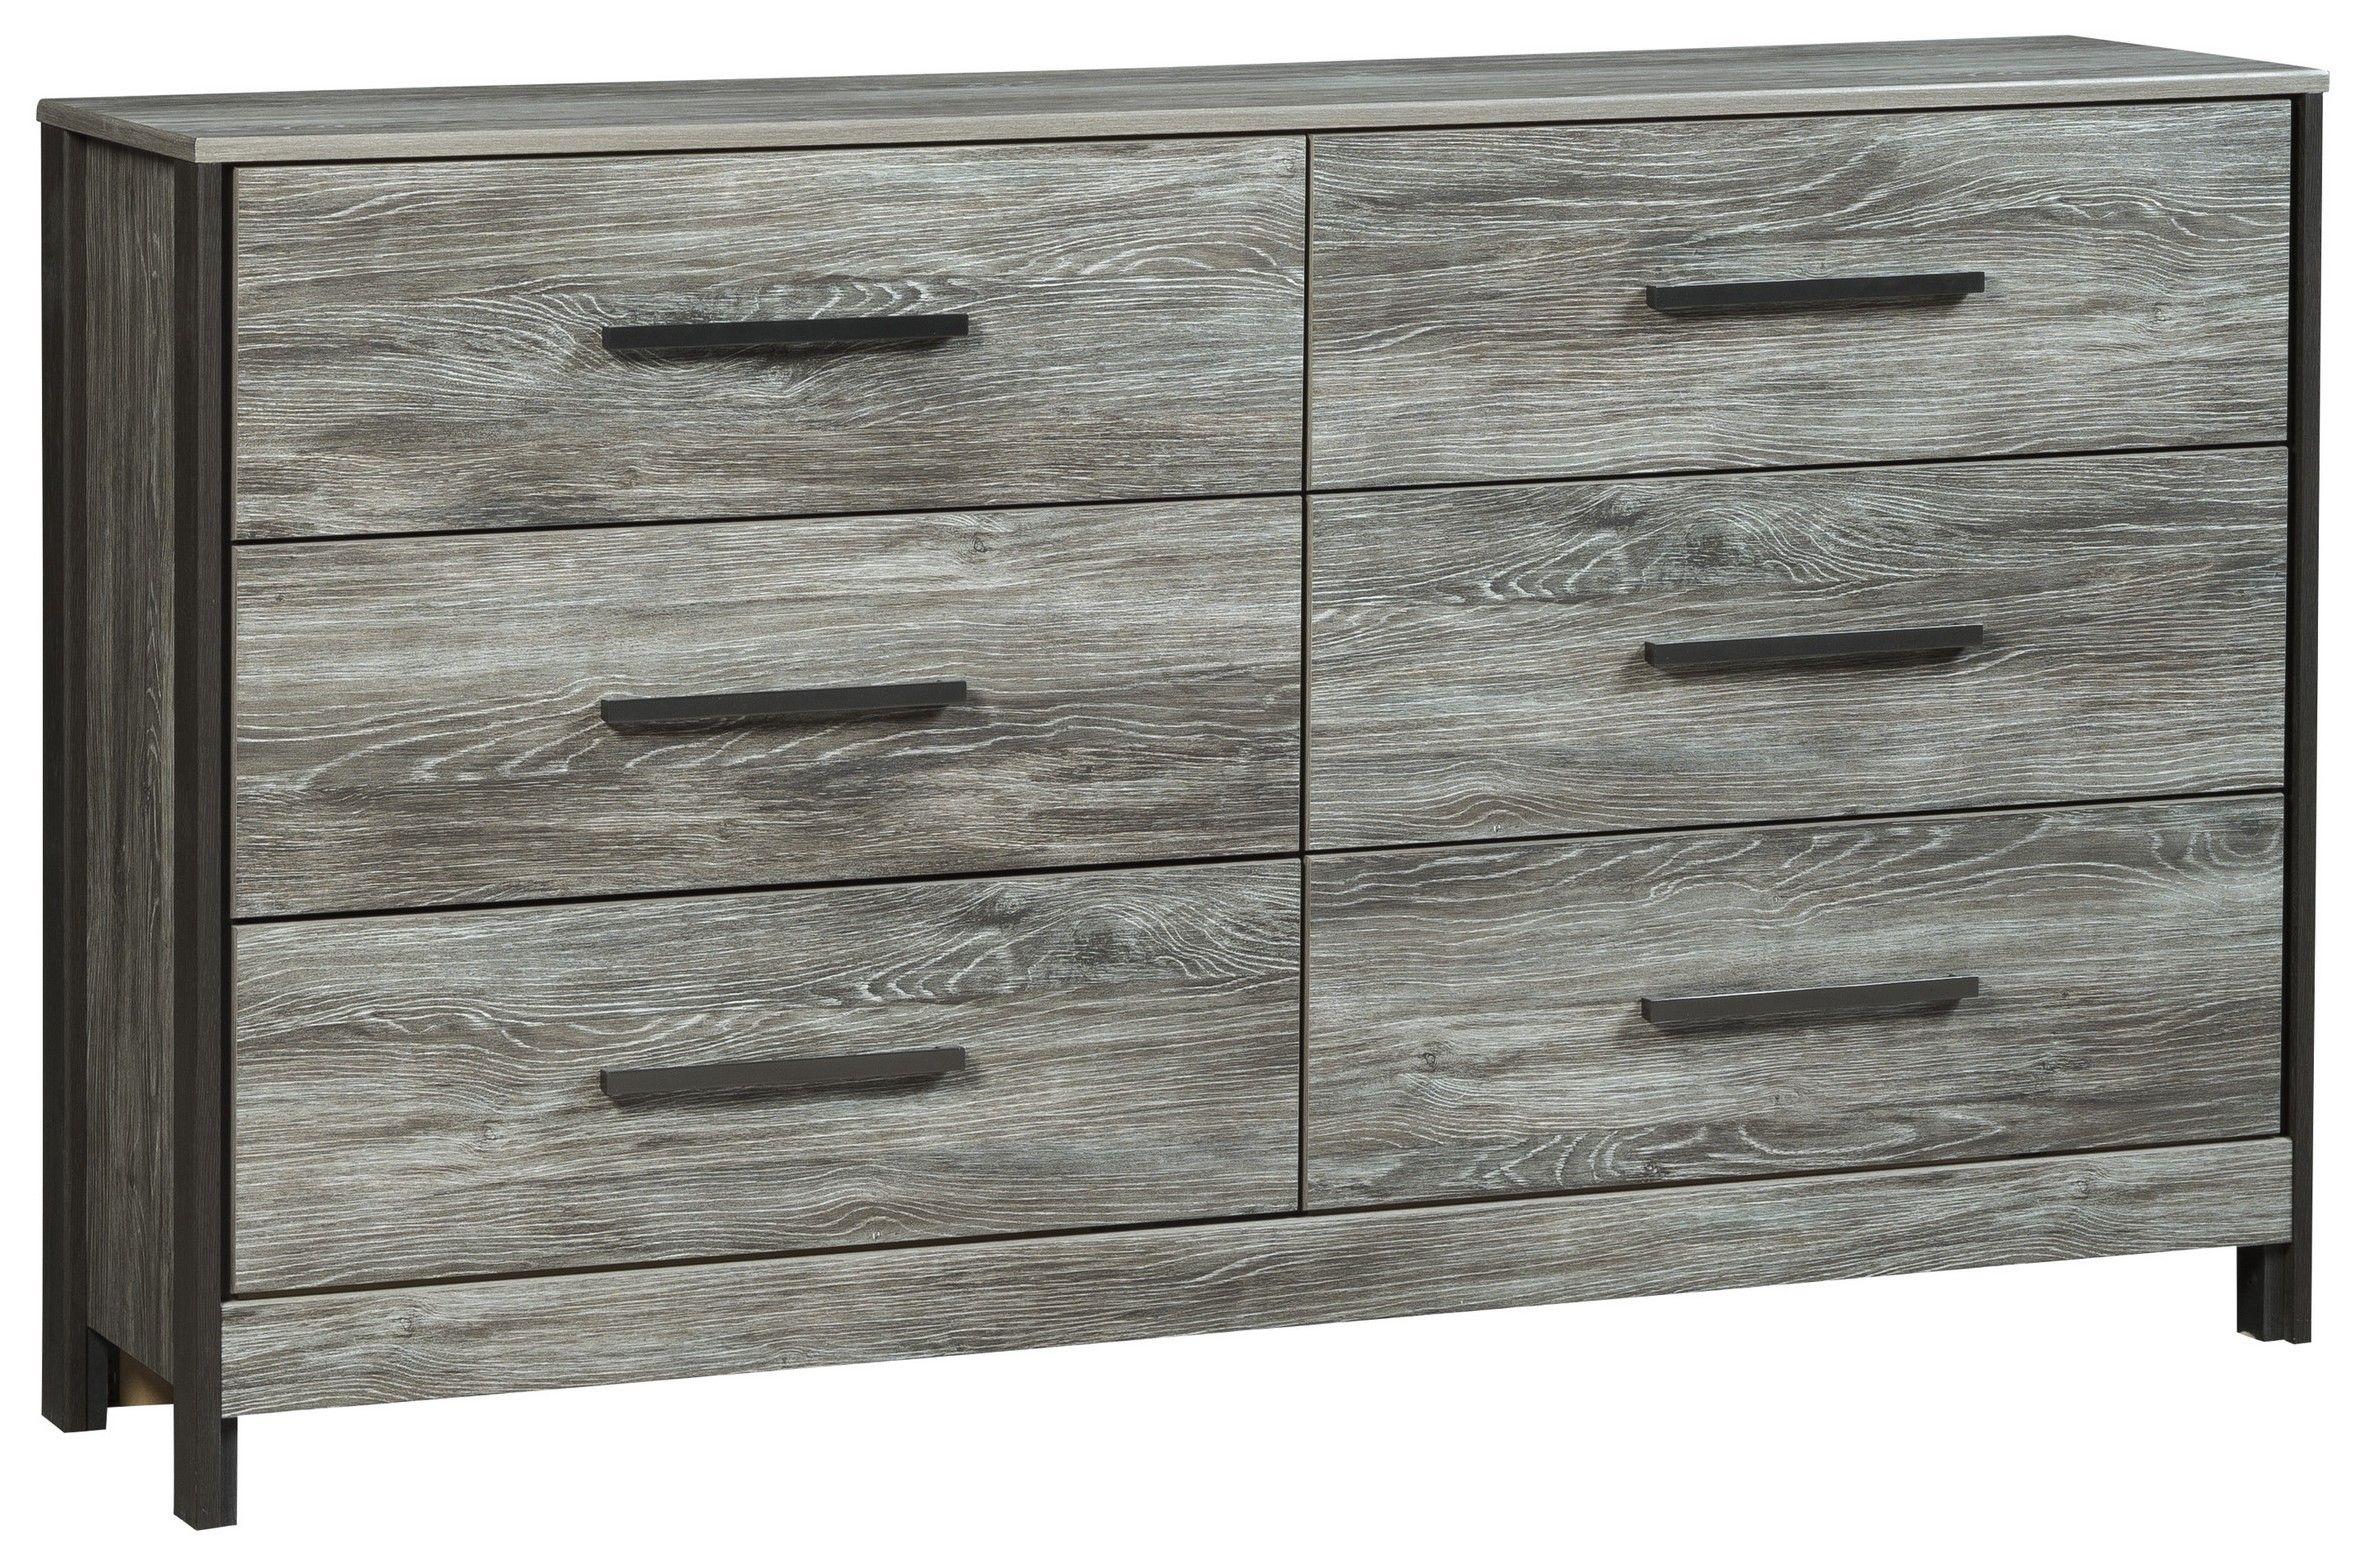 Signature Design By Ashley Cazenfeld Black Gray Dresser B227 31 Goedekers Com Double Dresser Furniture Grey Dresser [ 1544 x 2355 Pixel ]